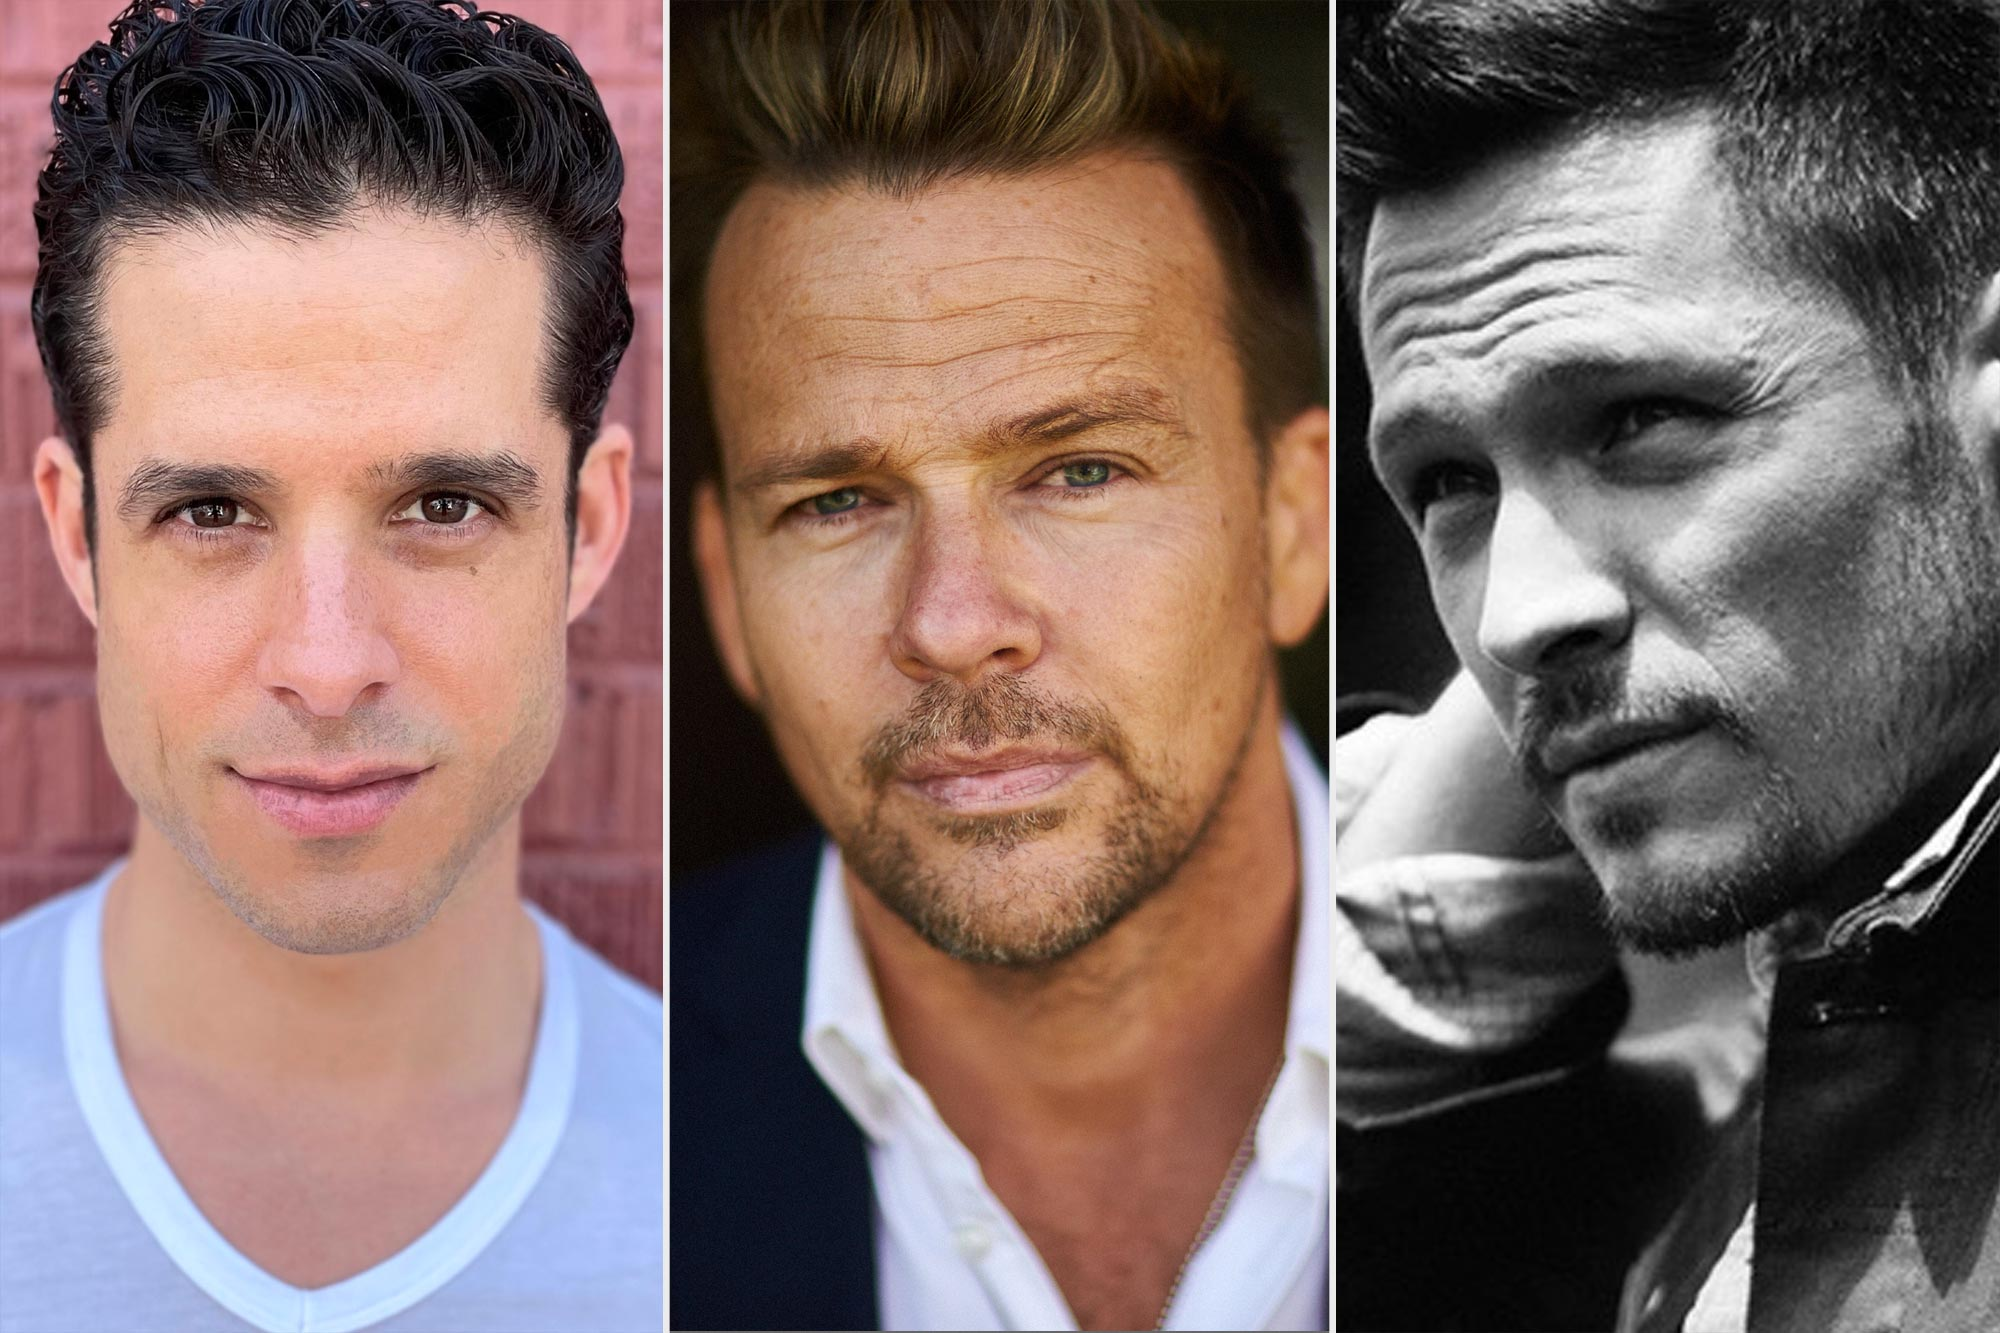 The Boys Casting Miles Gaston Villanueva, Sean Patrick Flanery; Nick Wechsler